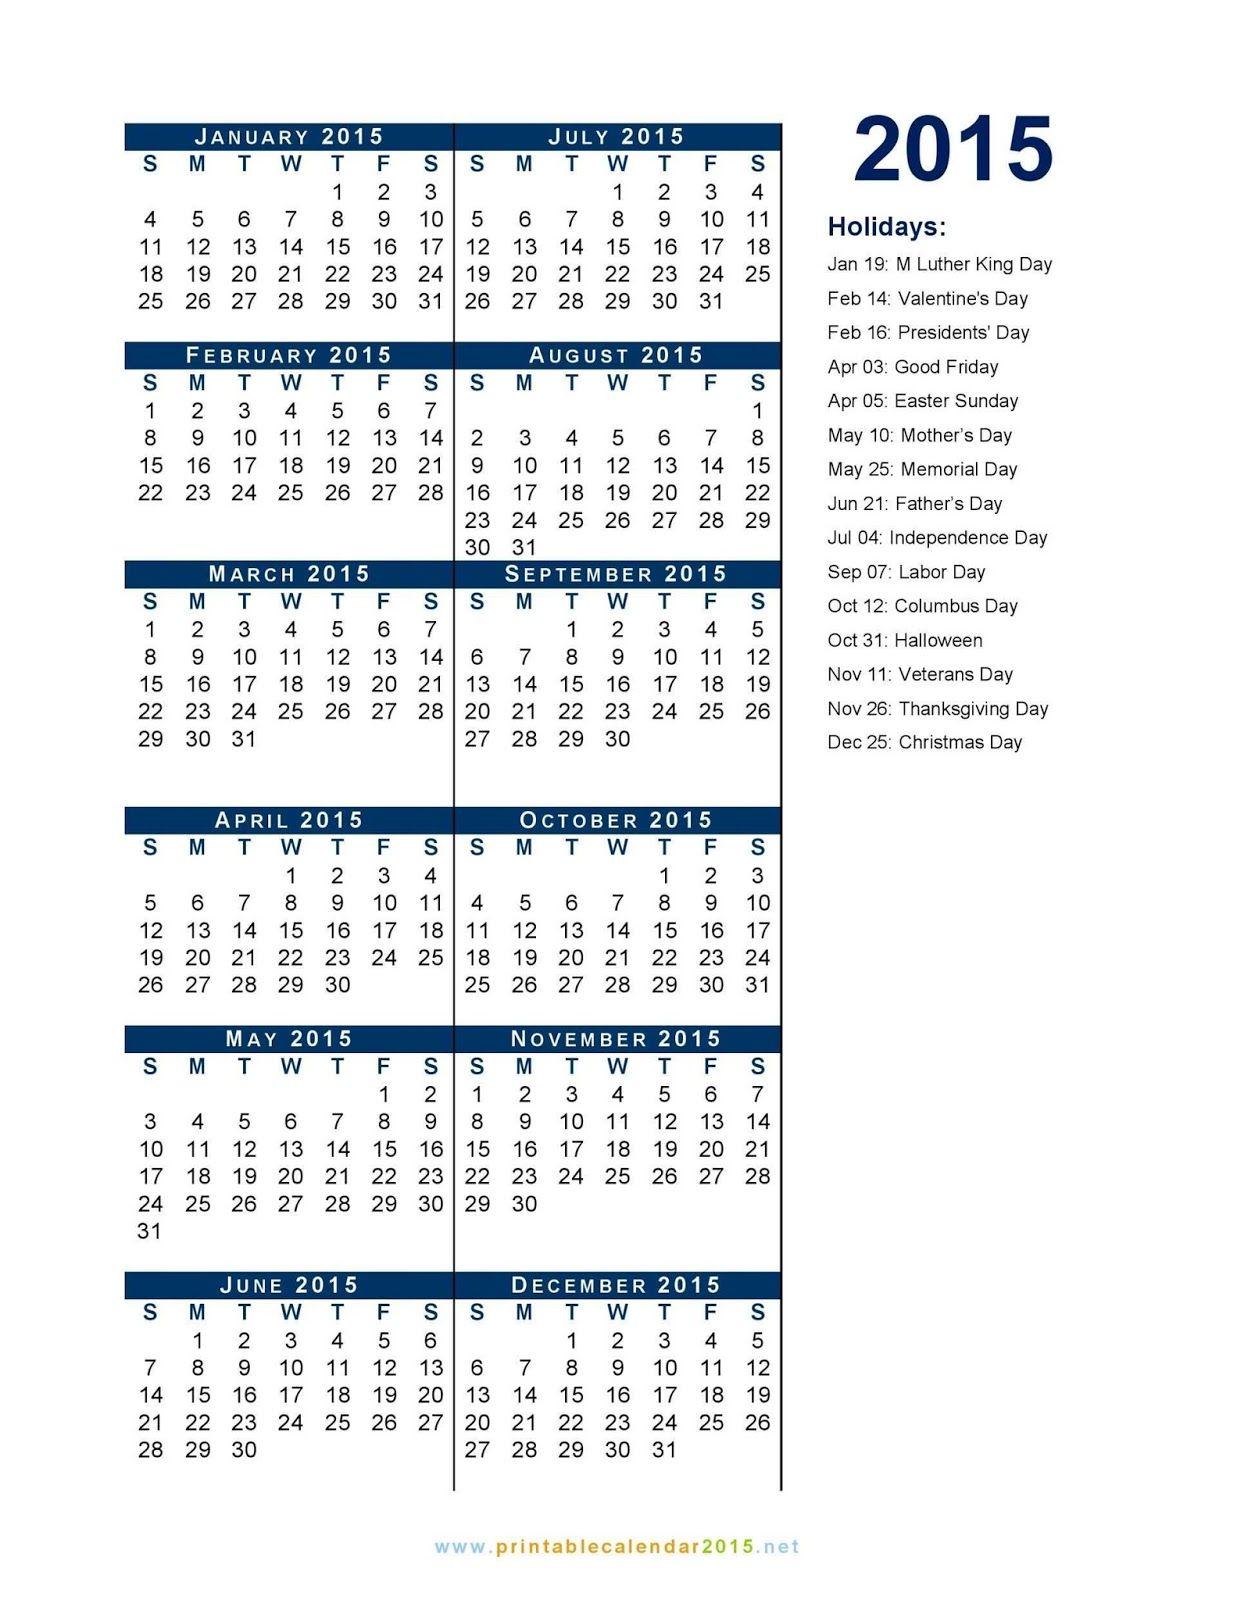 Federal holidays calendar printable calendar template